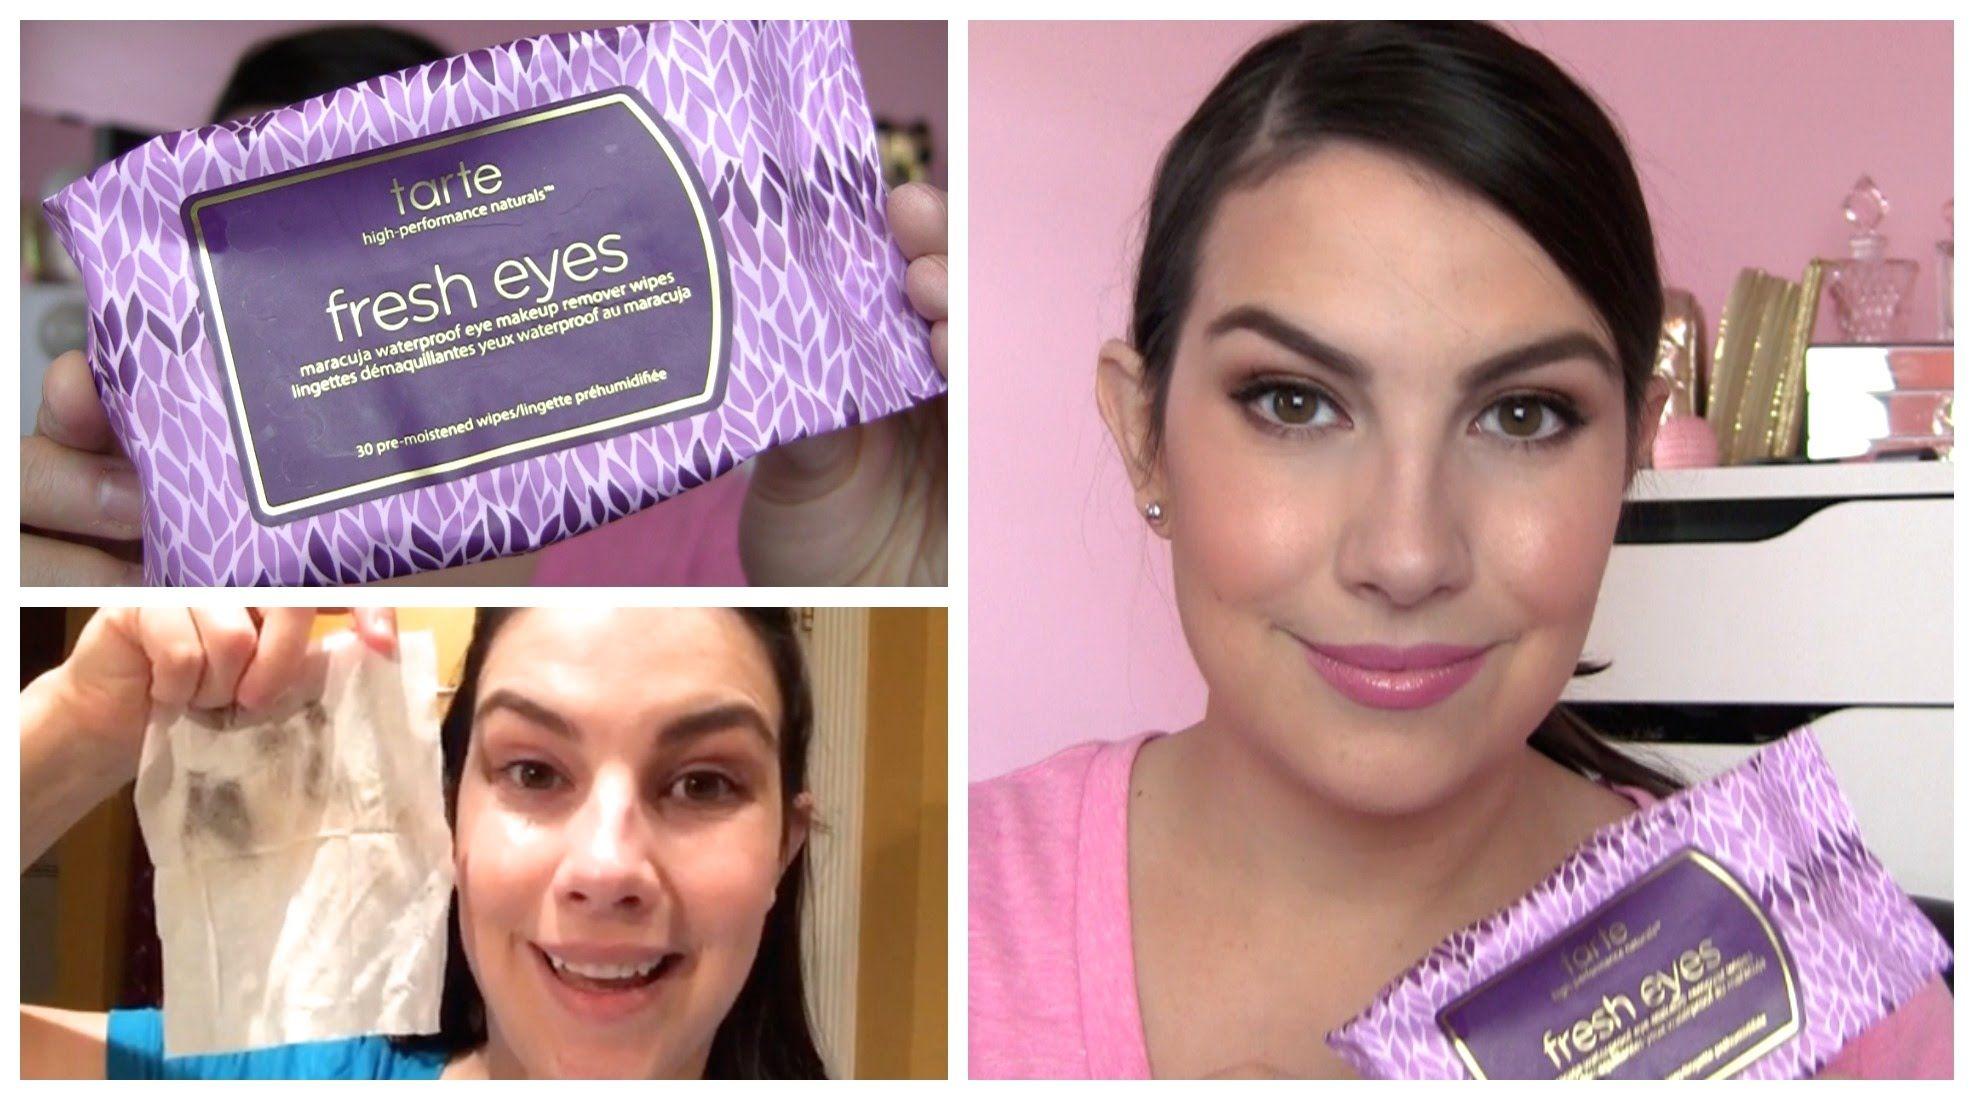 Tarte Fresh Eyes Eye Makeup Remover Wipes Review Eye